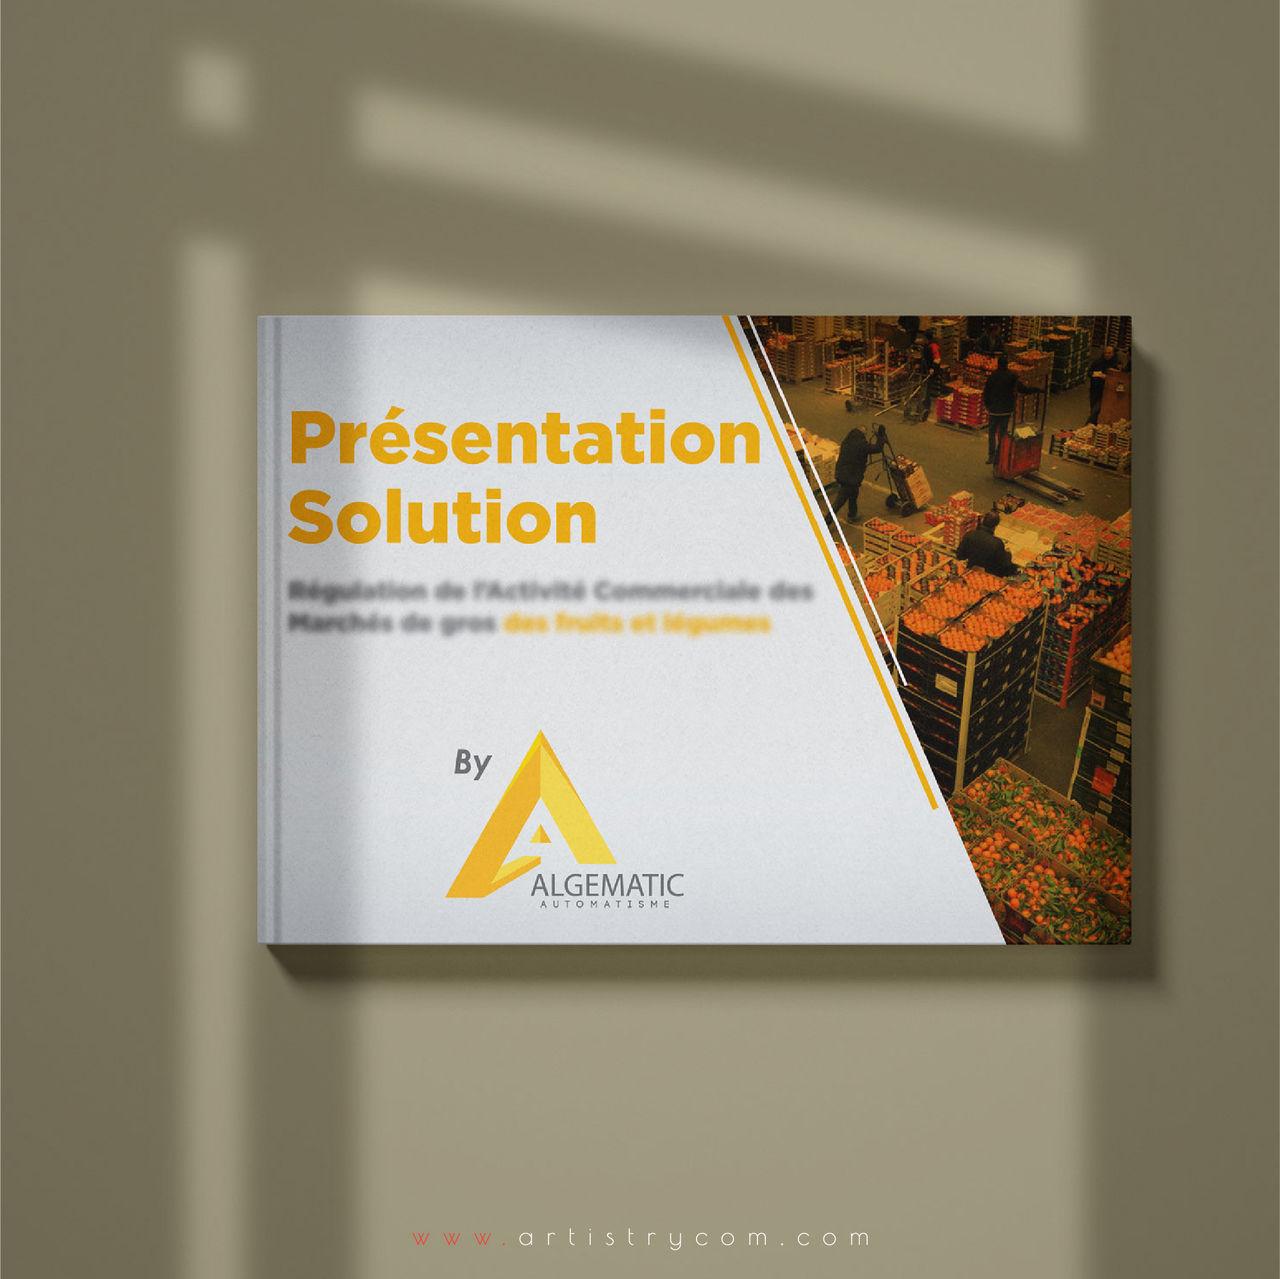 Realisation d'une presentation solution